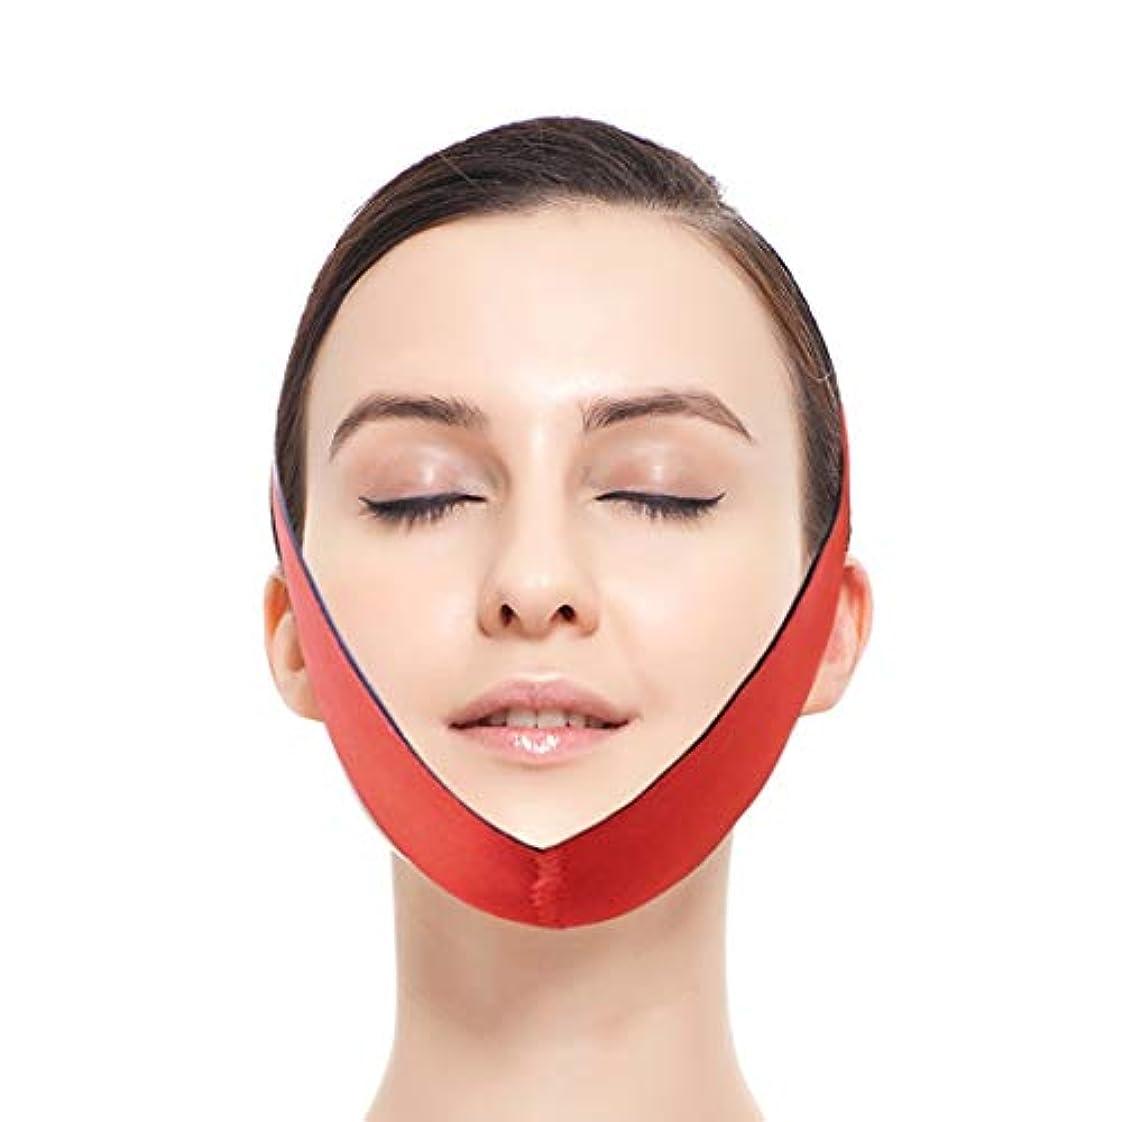 ZWBD フェイスマスク, 顔を持ち上げる包帯V顔リフティング引き締めの美しさ薄い顔包帯眠っている男性と女性と顎セット持ち上げタイトな睡眠